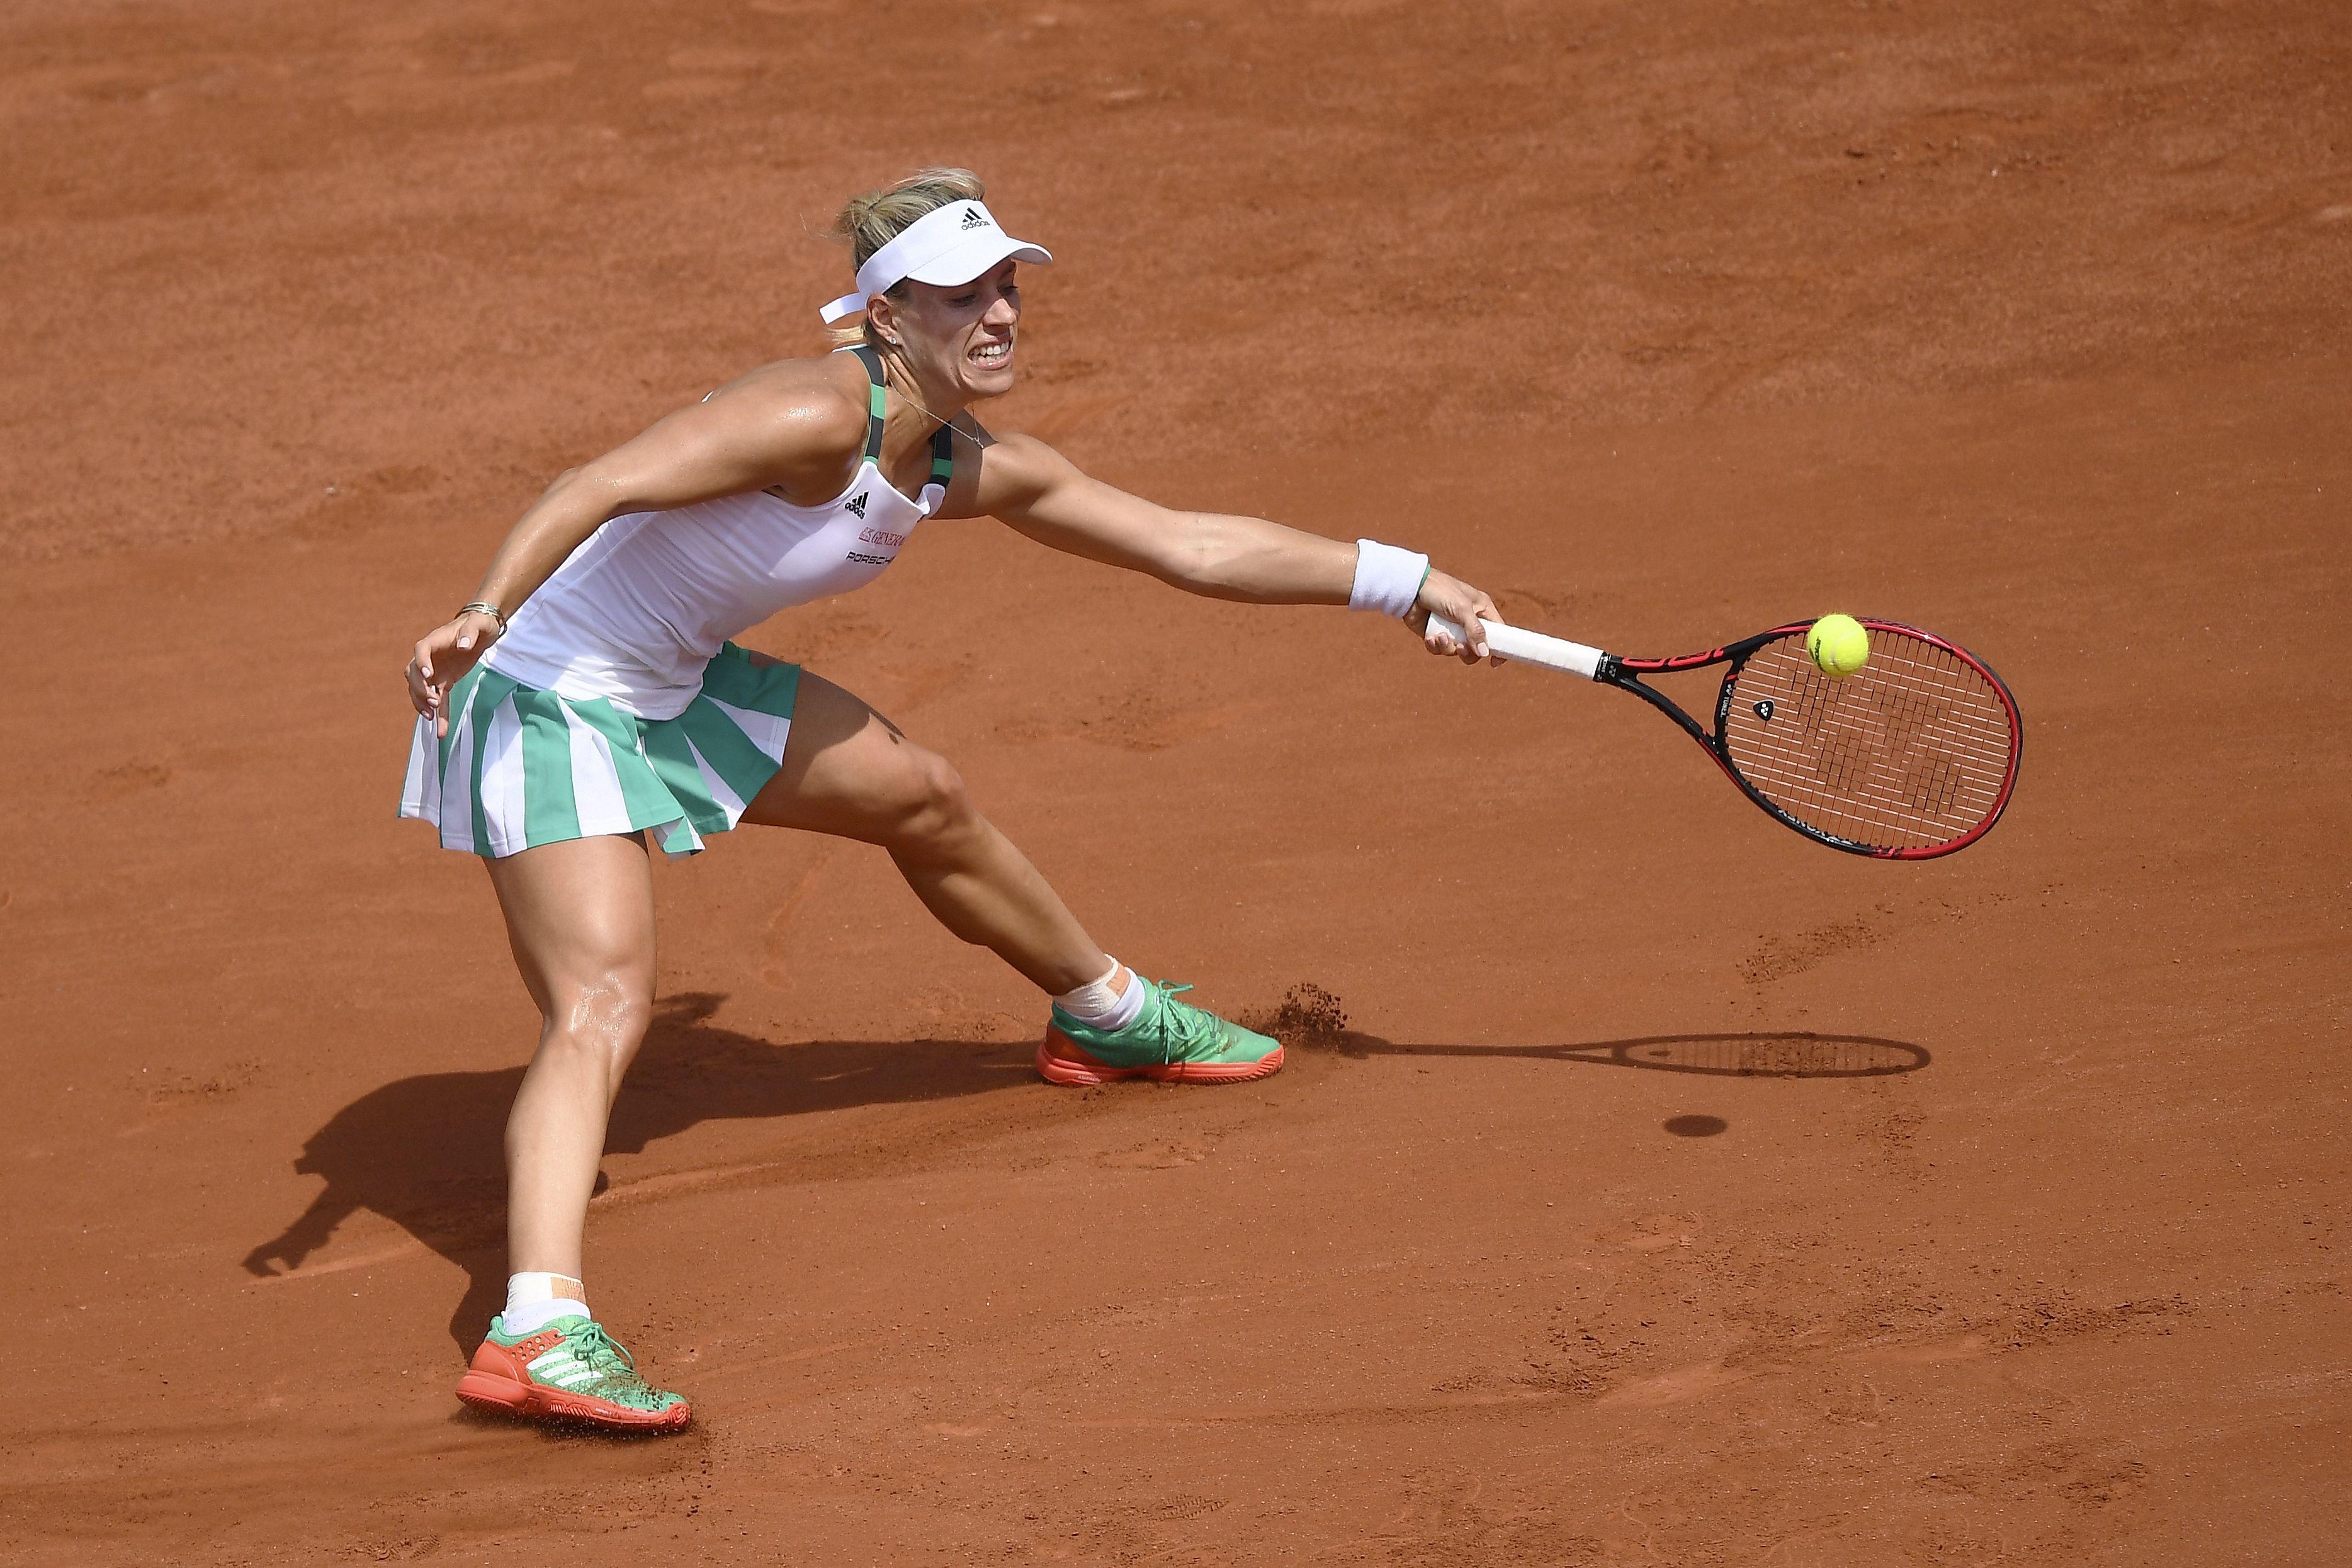 Alles andere als optimal: Bei den French Open schied Angelique Kerber bereits in der ersten Runde gegen die Russin Ekaterina Makarova aus.